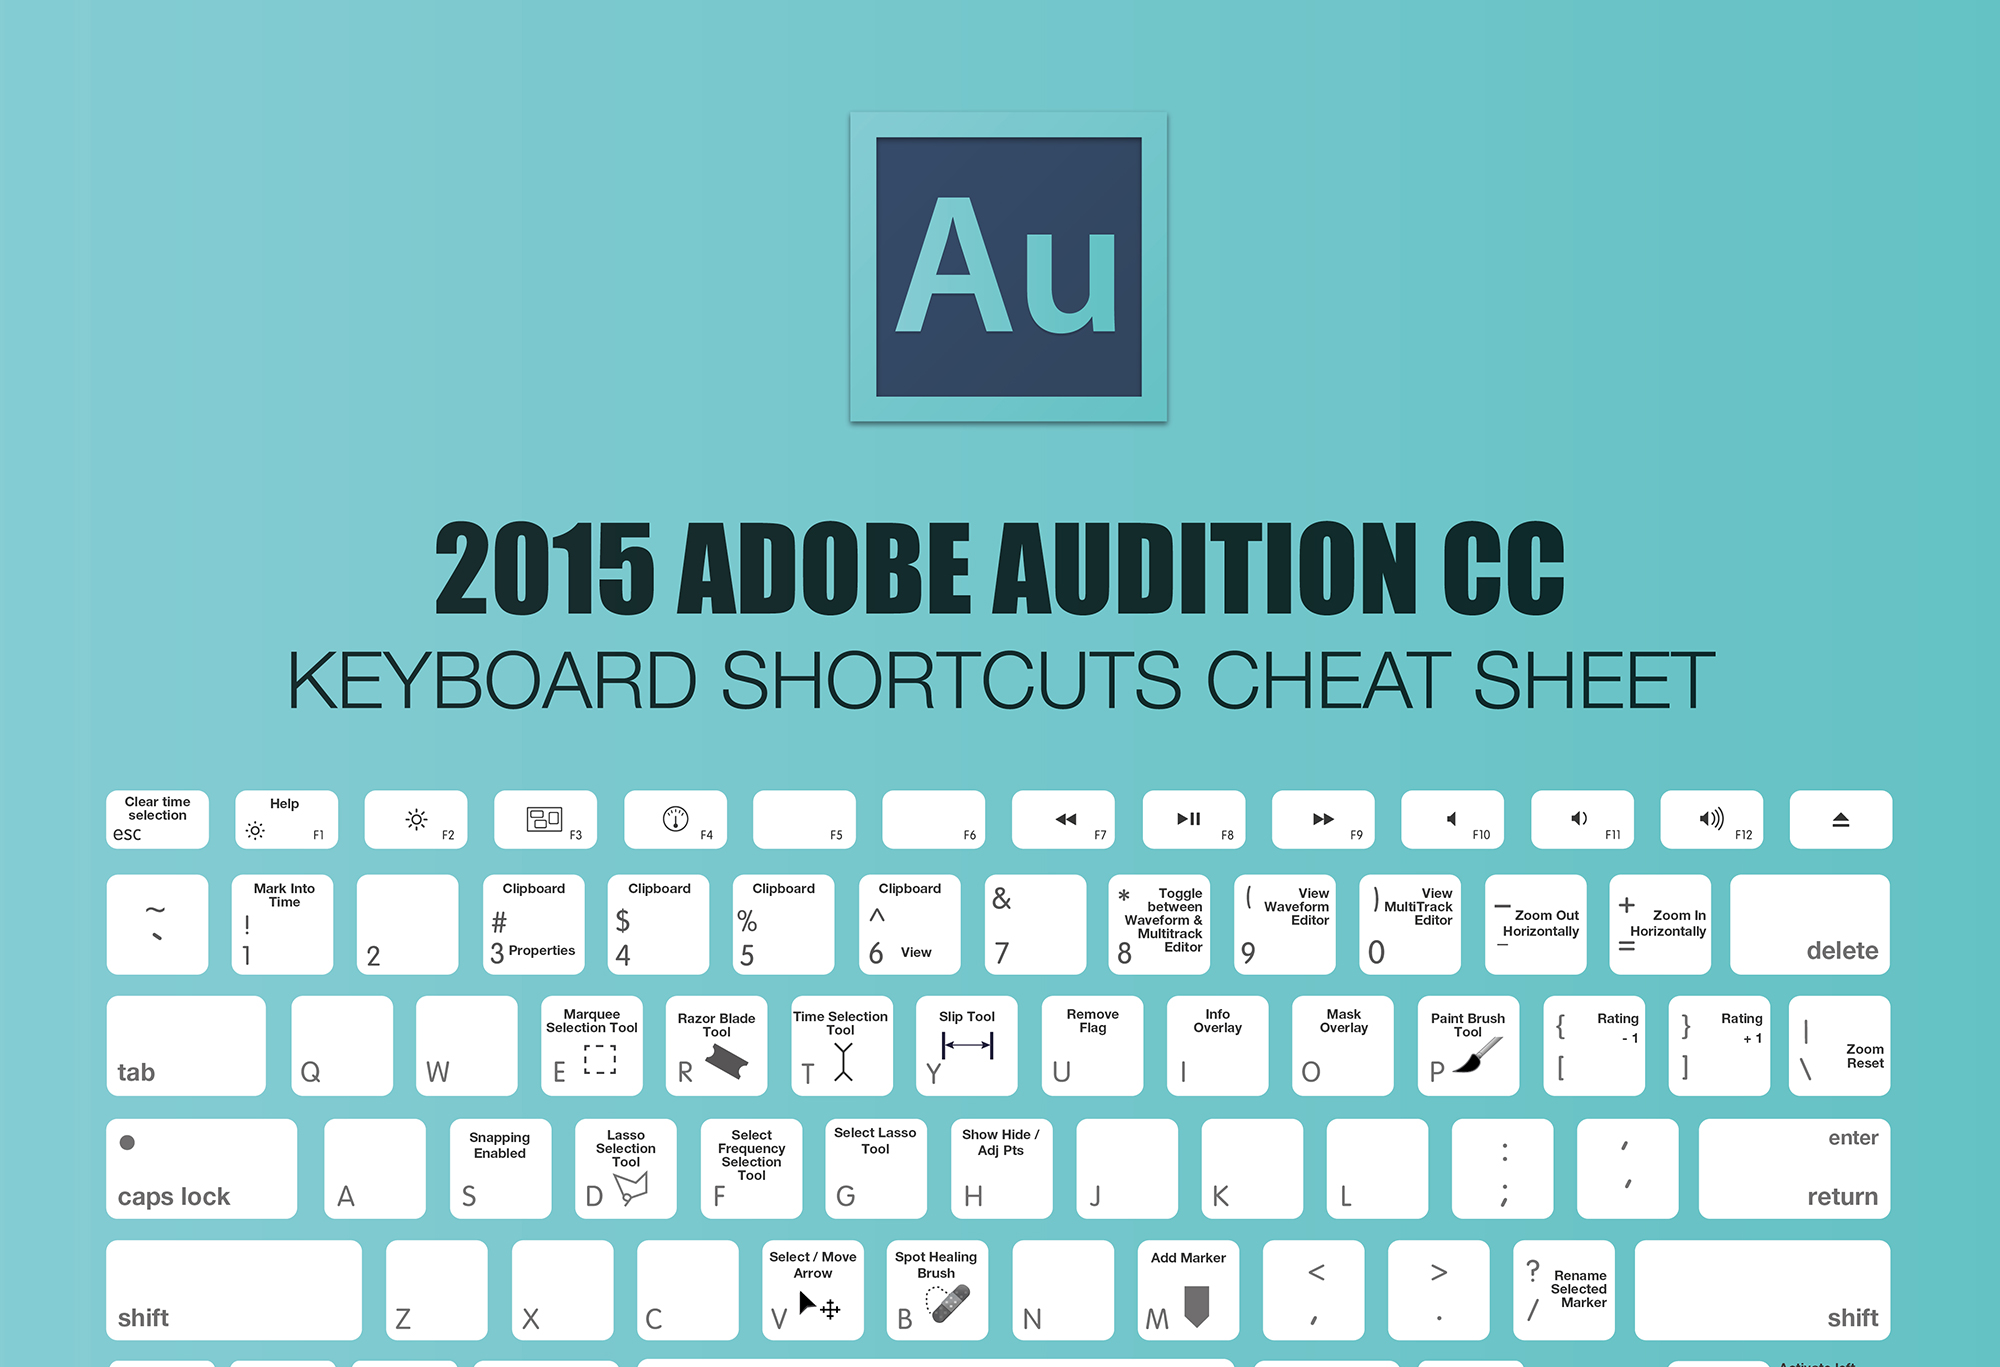 Adobe Audition CC Keyboard ShortCuts 2015 – Cheat Sheet